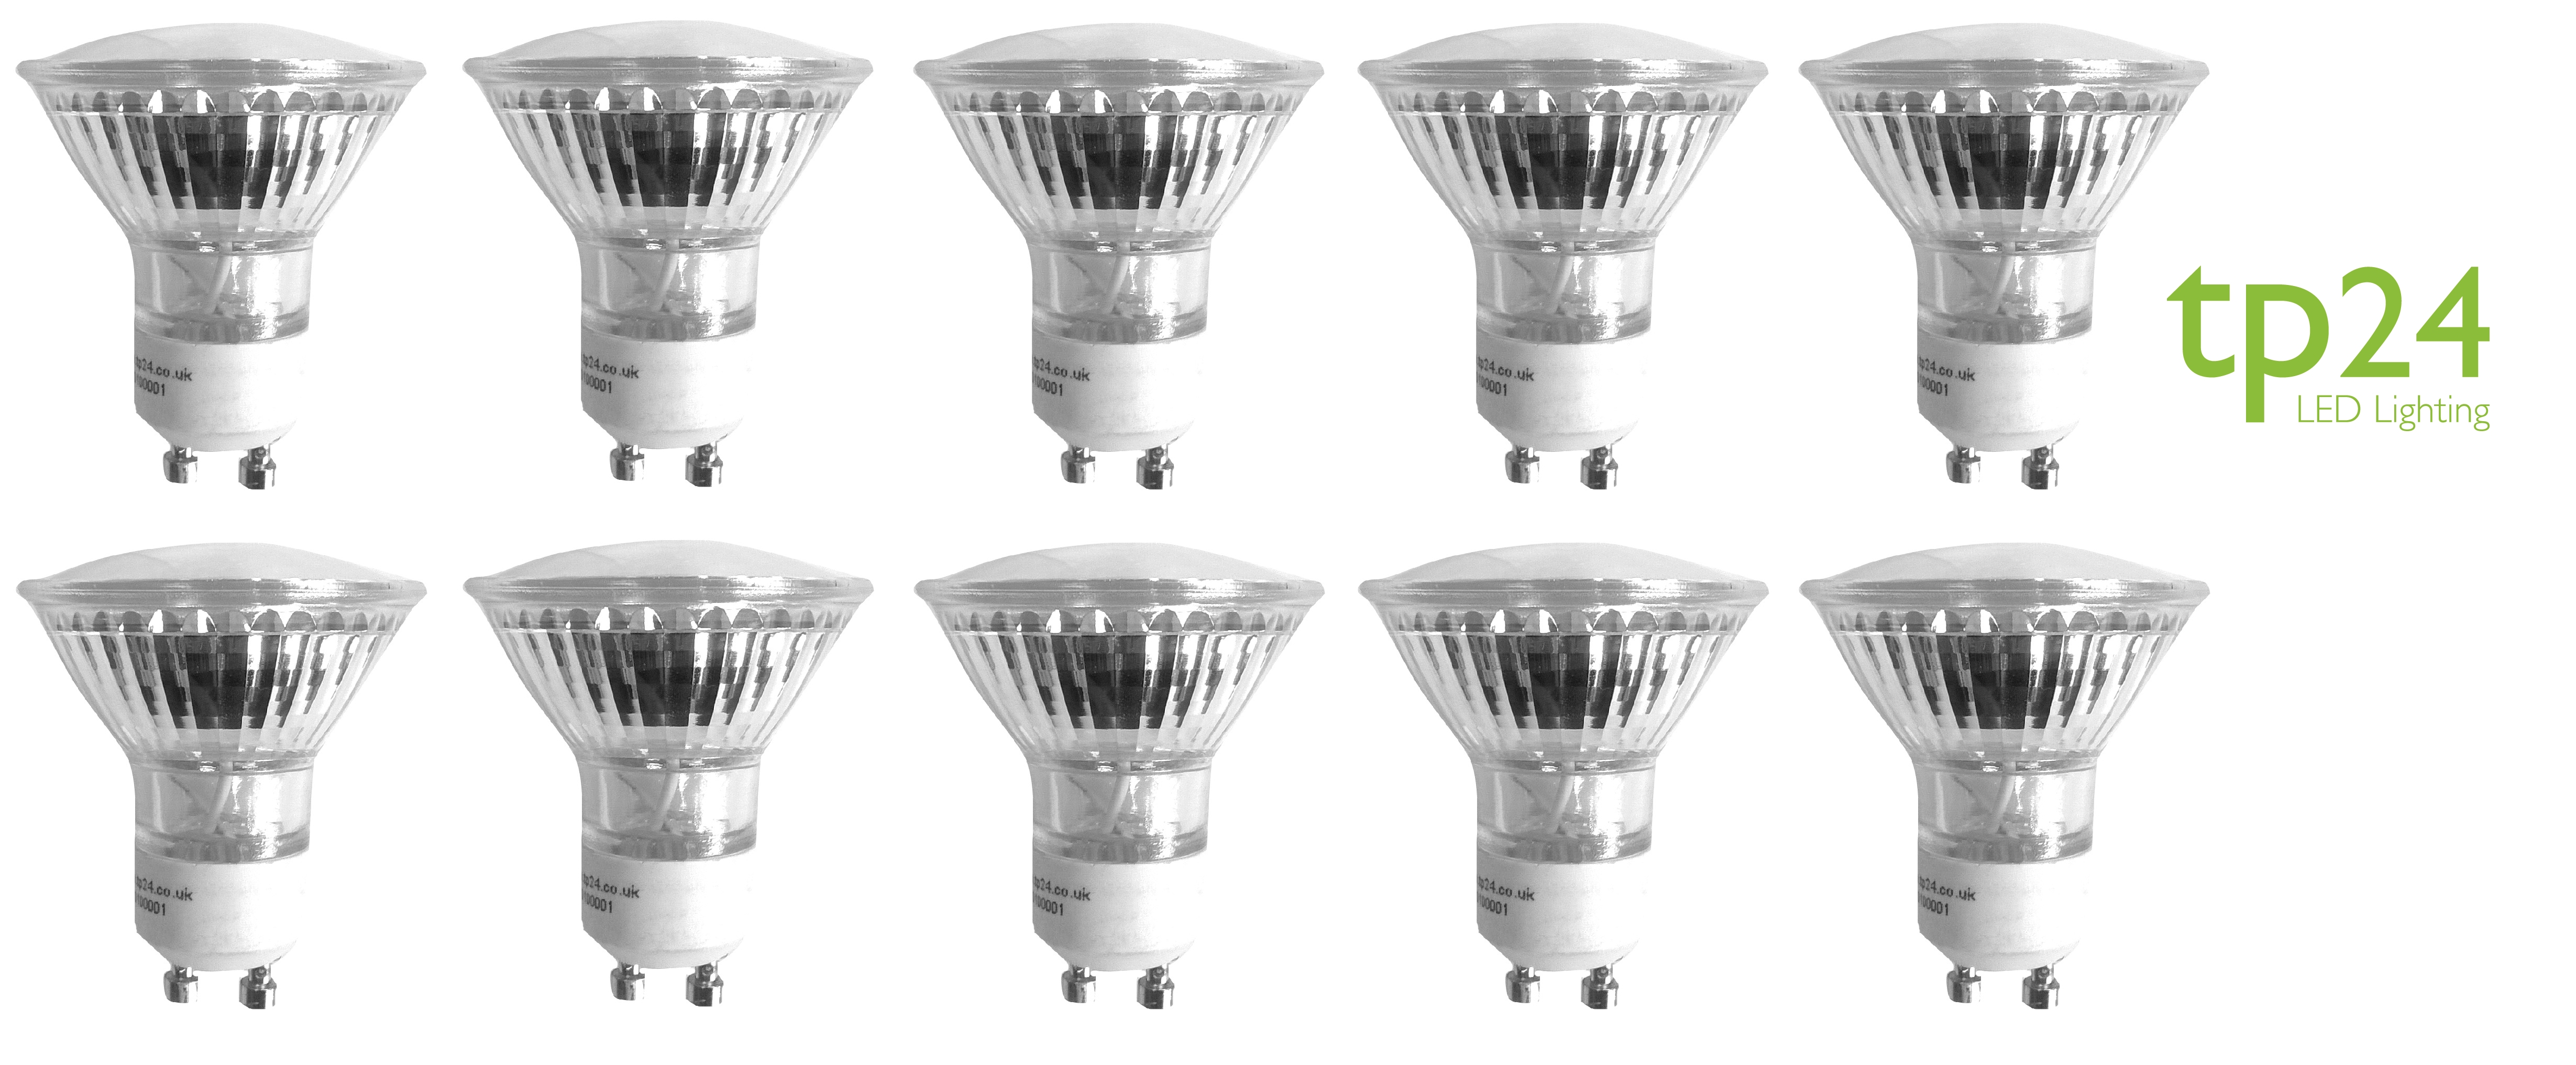 Led Light Electrical Energy